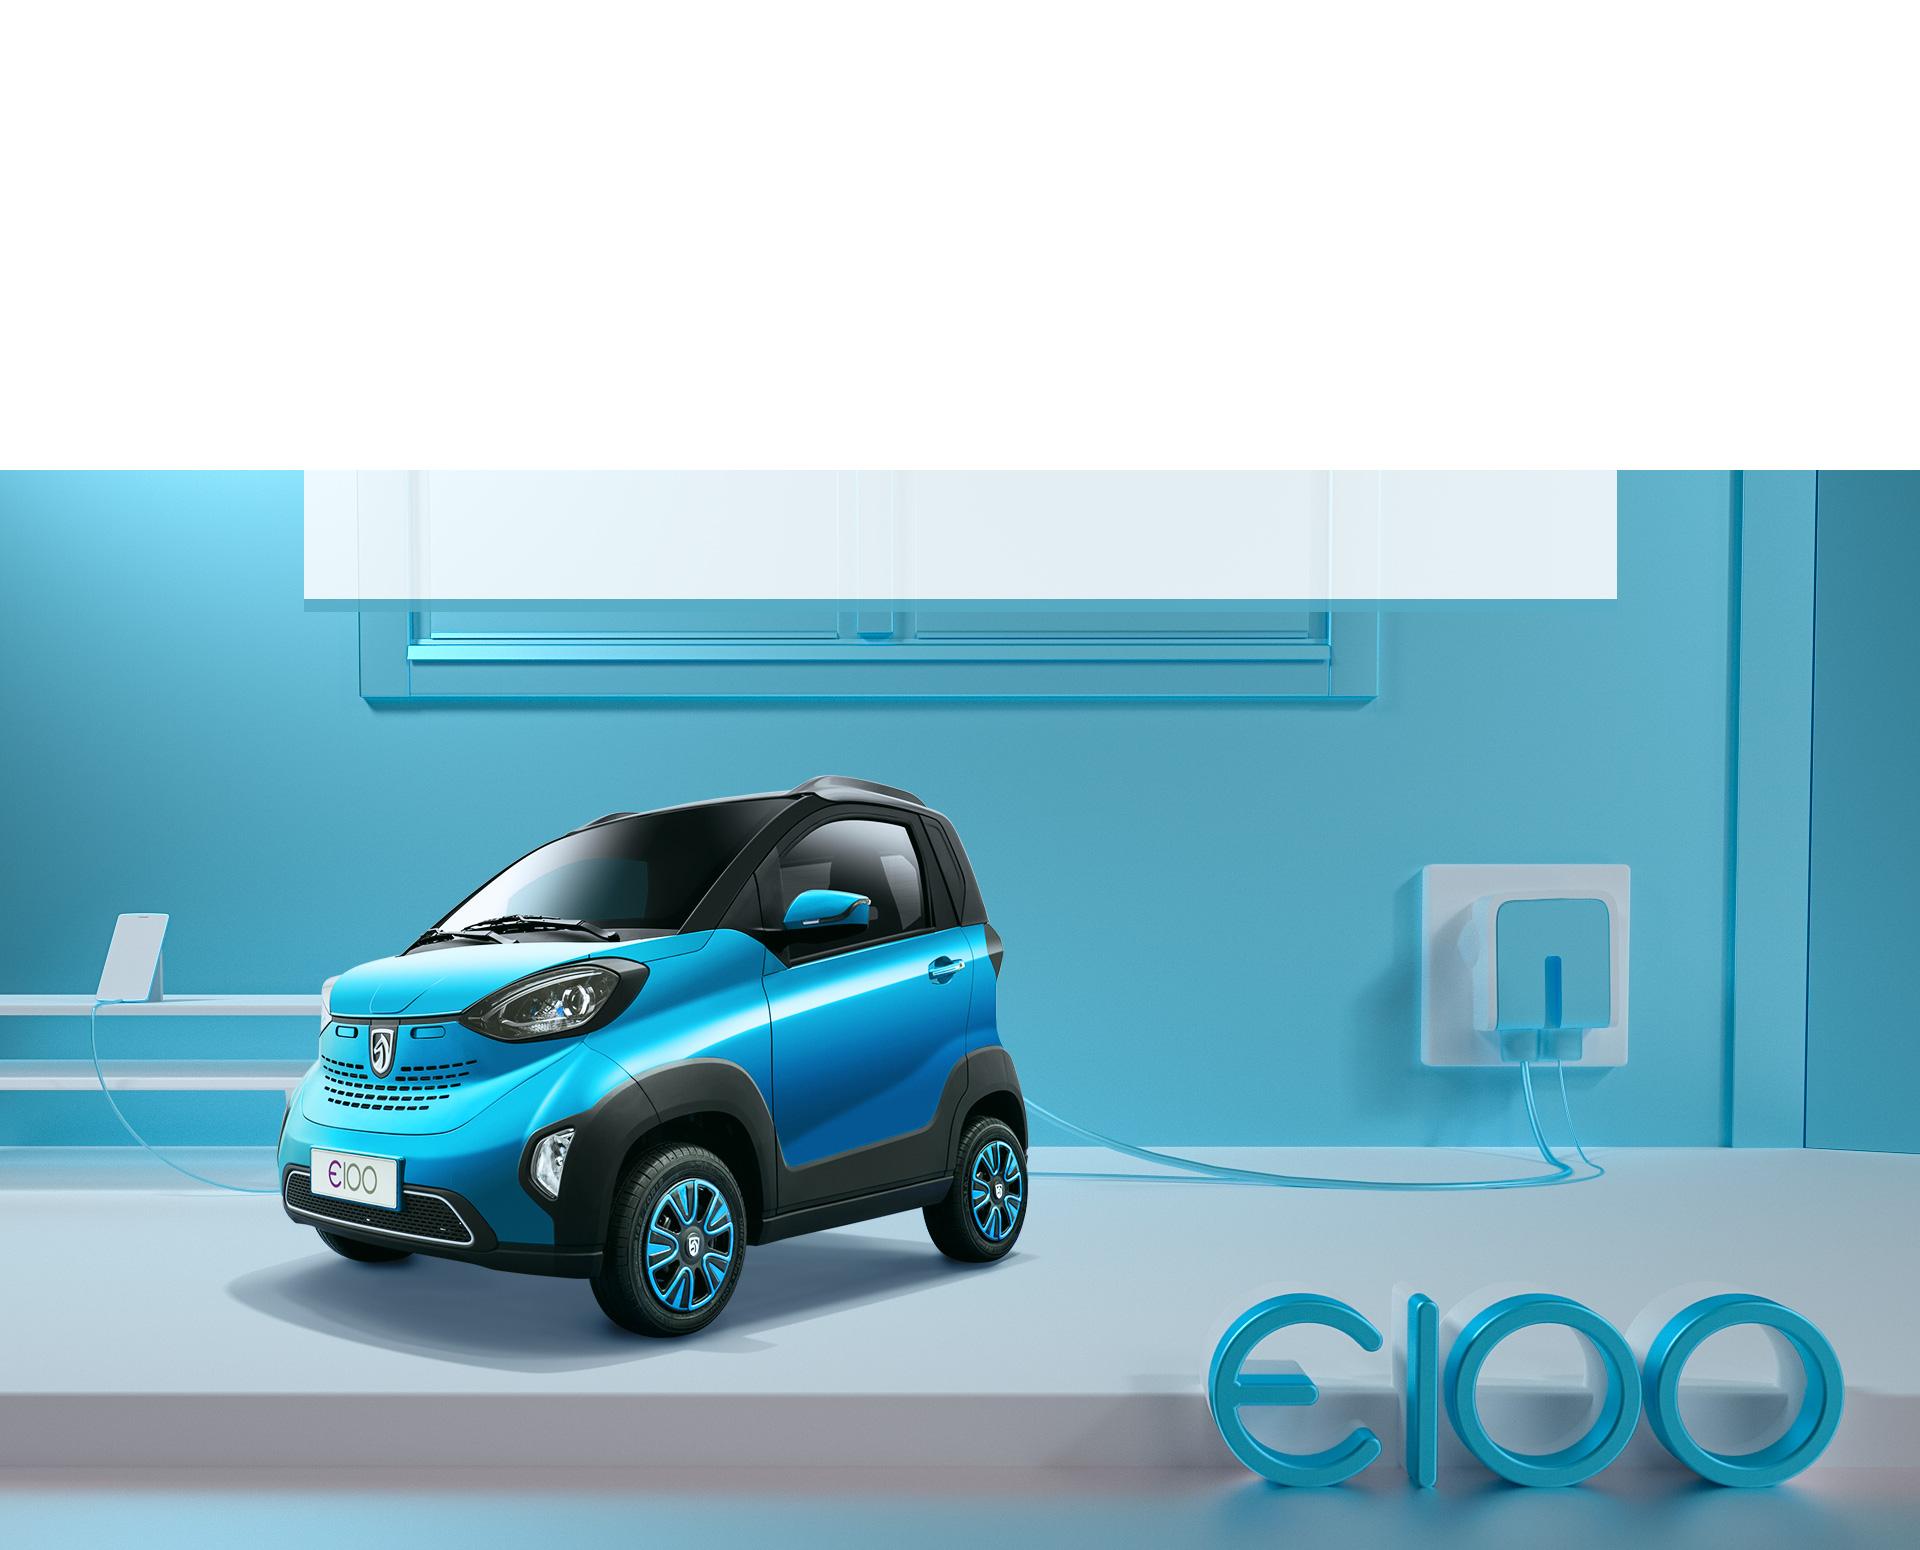 寶(bao)駿E100,電動(dong)汽(qi)車,新能源(yuan)車,車身,充電,節能,圖片